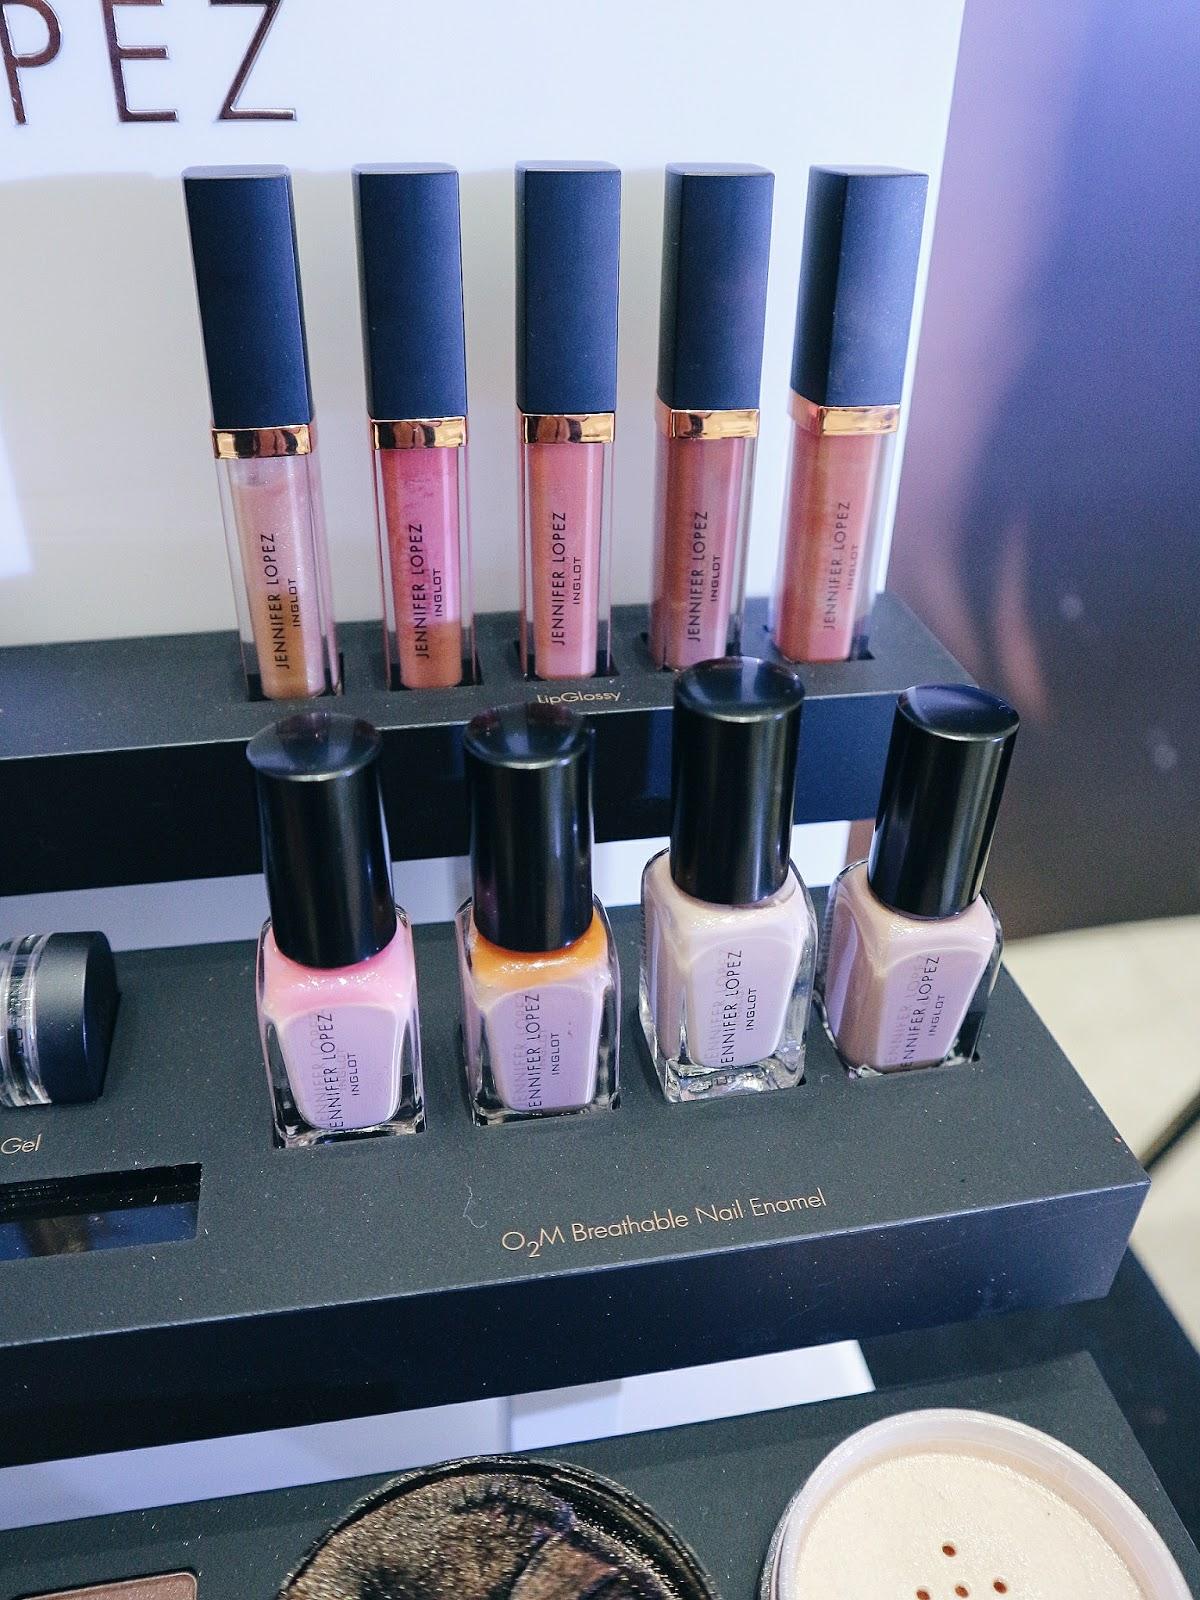 Jennifer Lopez Inglot makeup collection